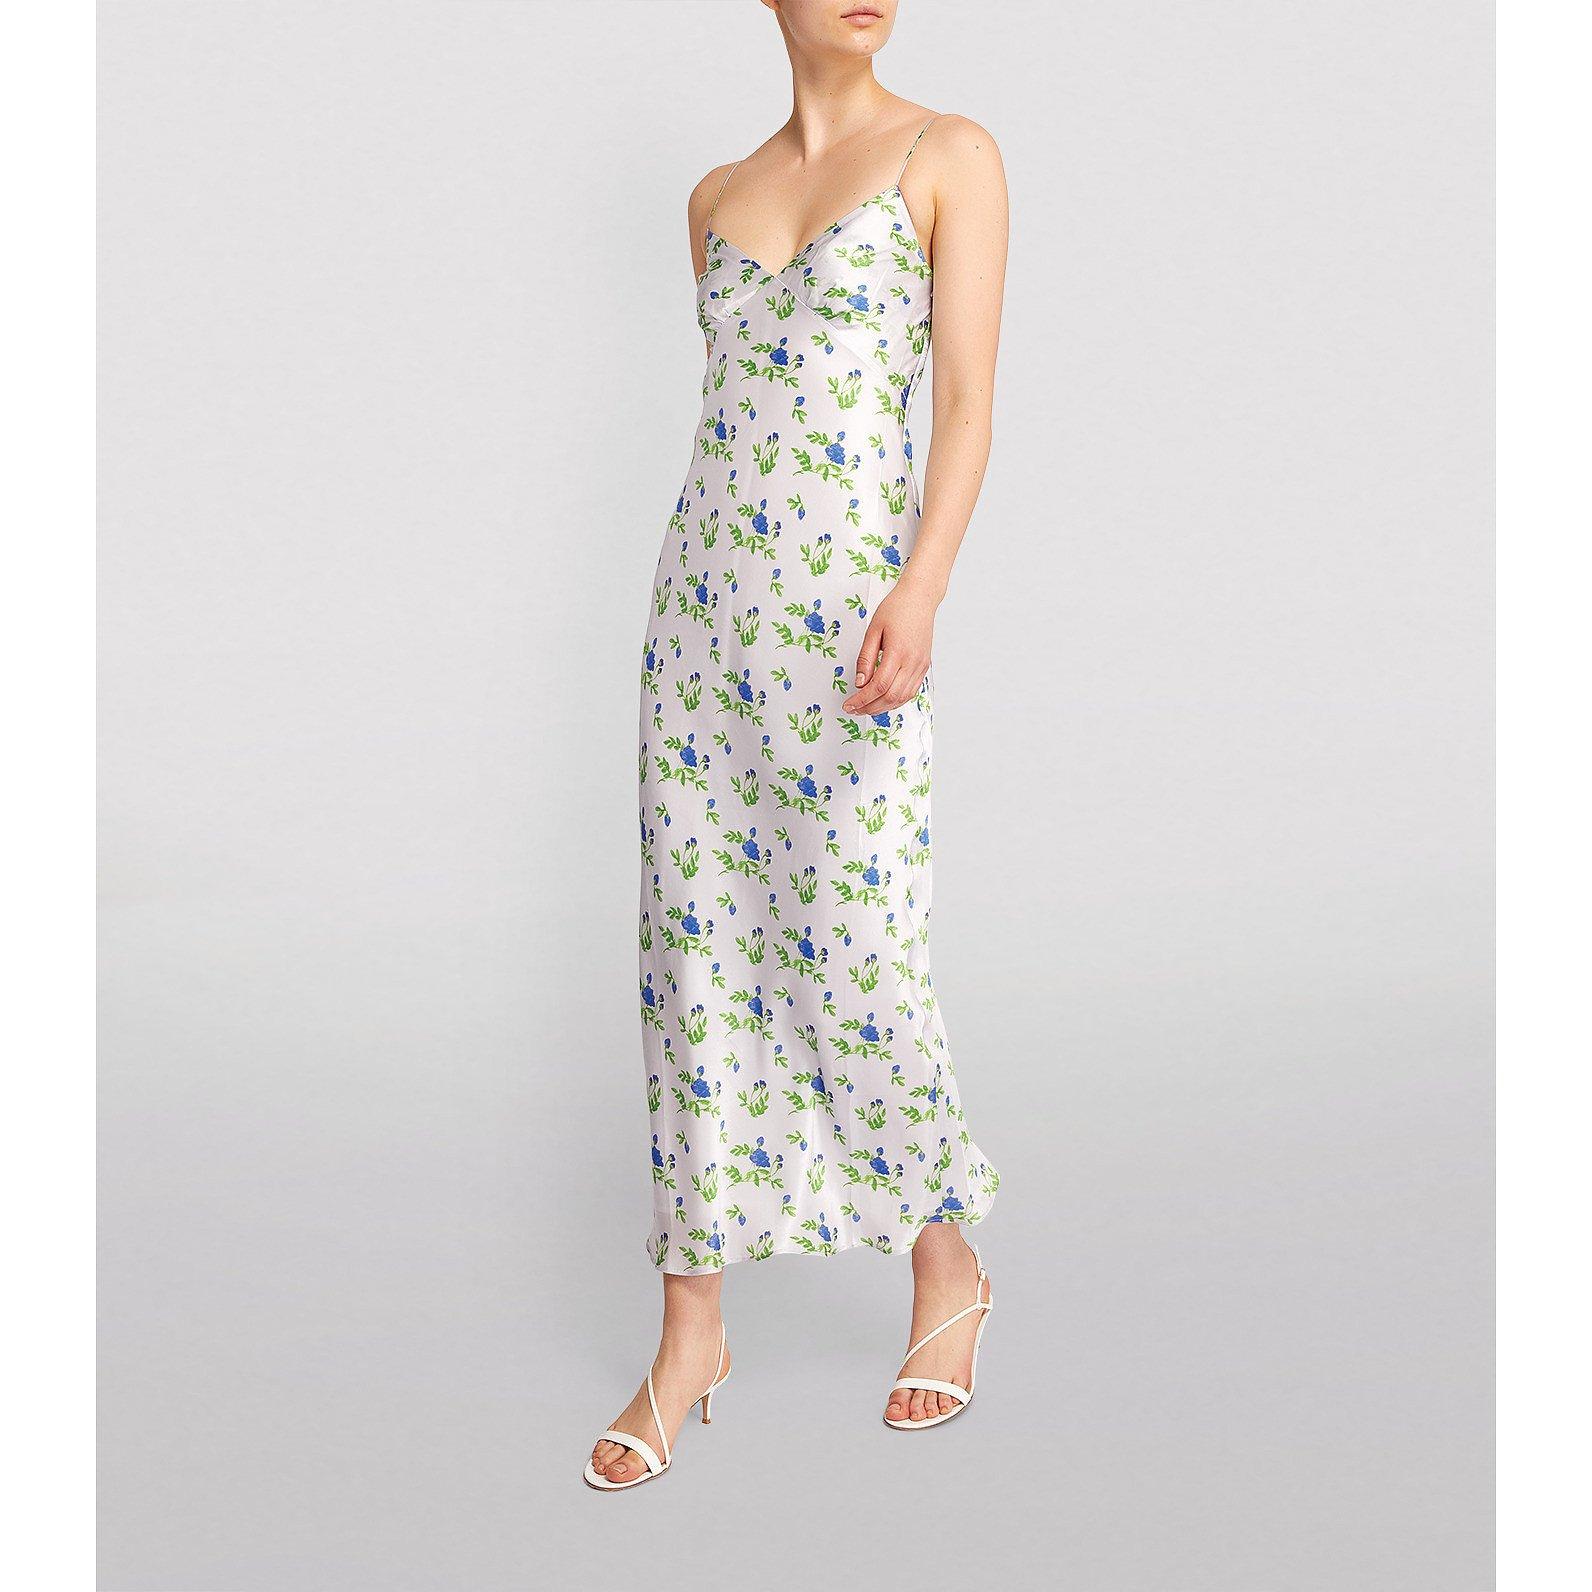 Bernadette Jeanette Floral Slip Dress